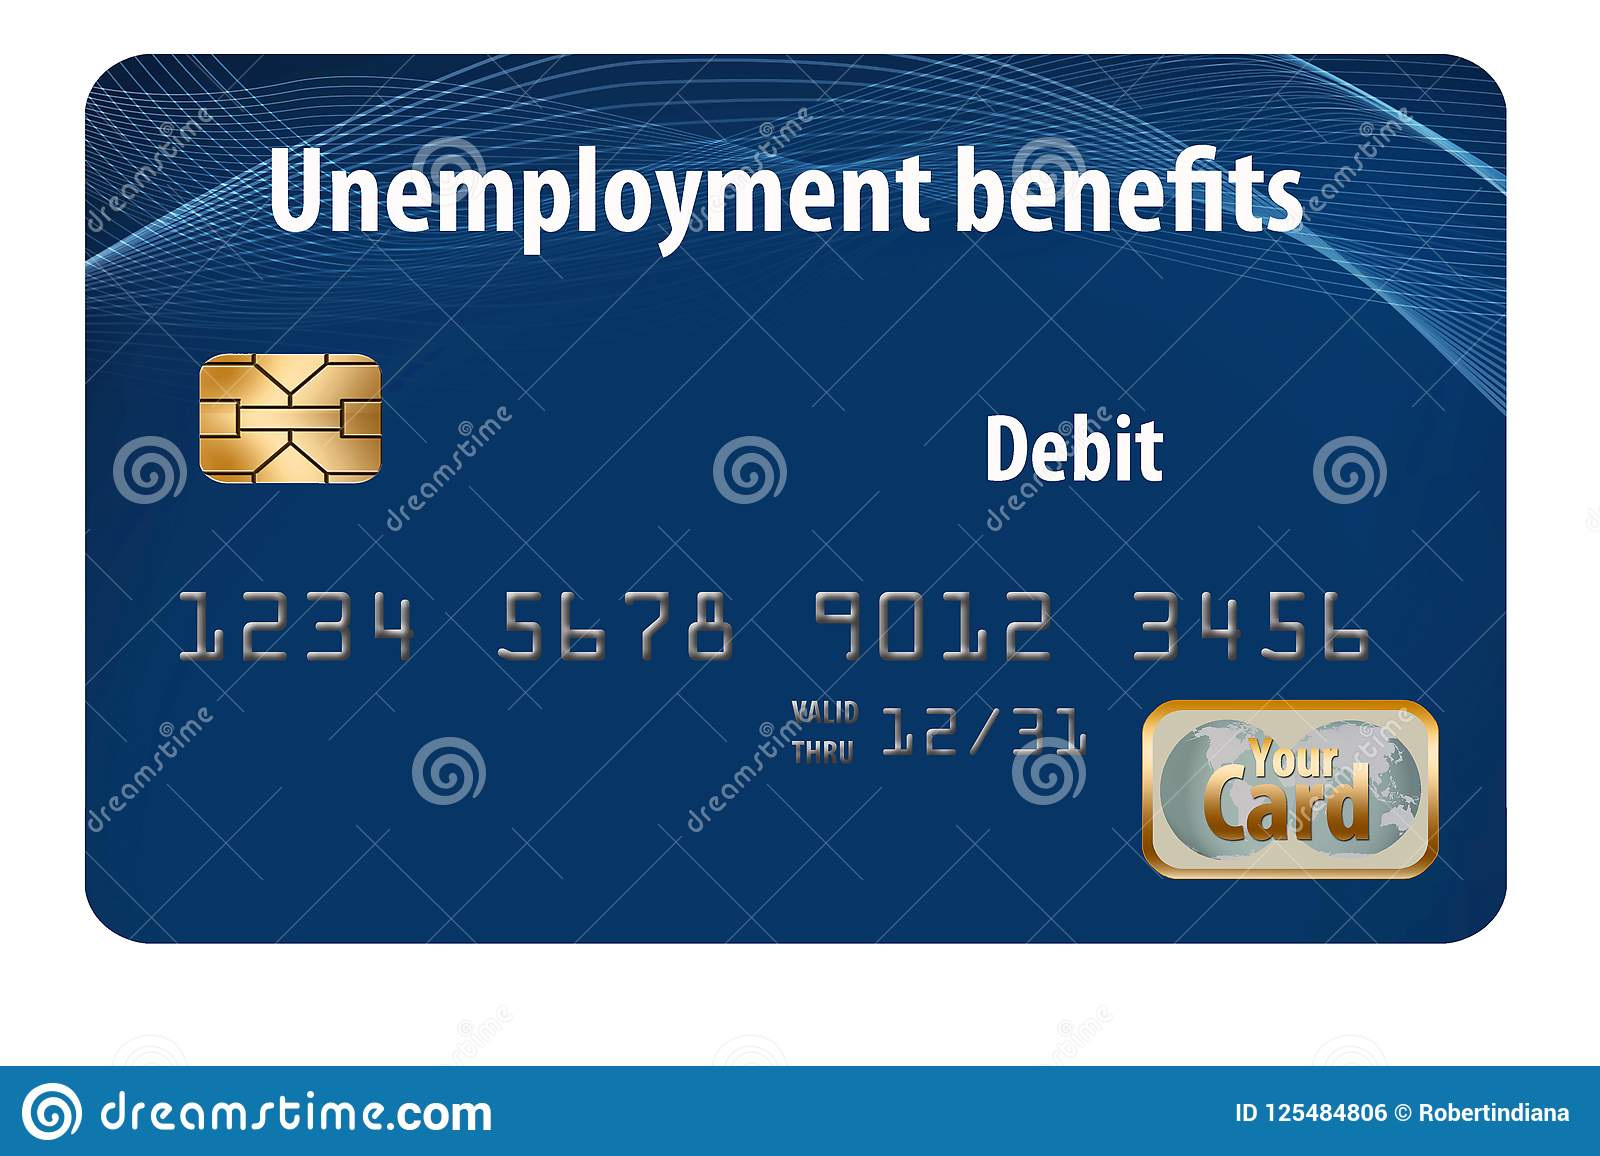 Here is a generic unemployment benefits debit card.